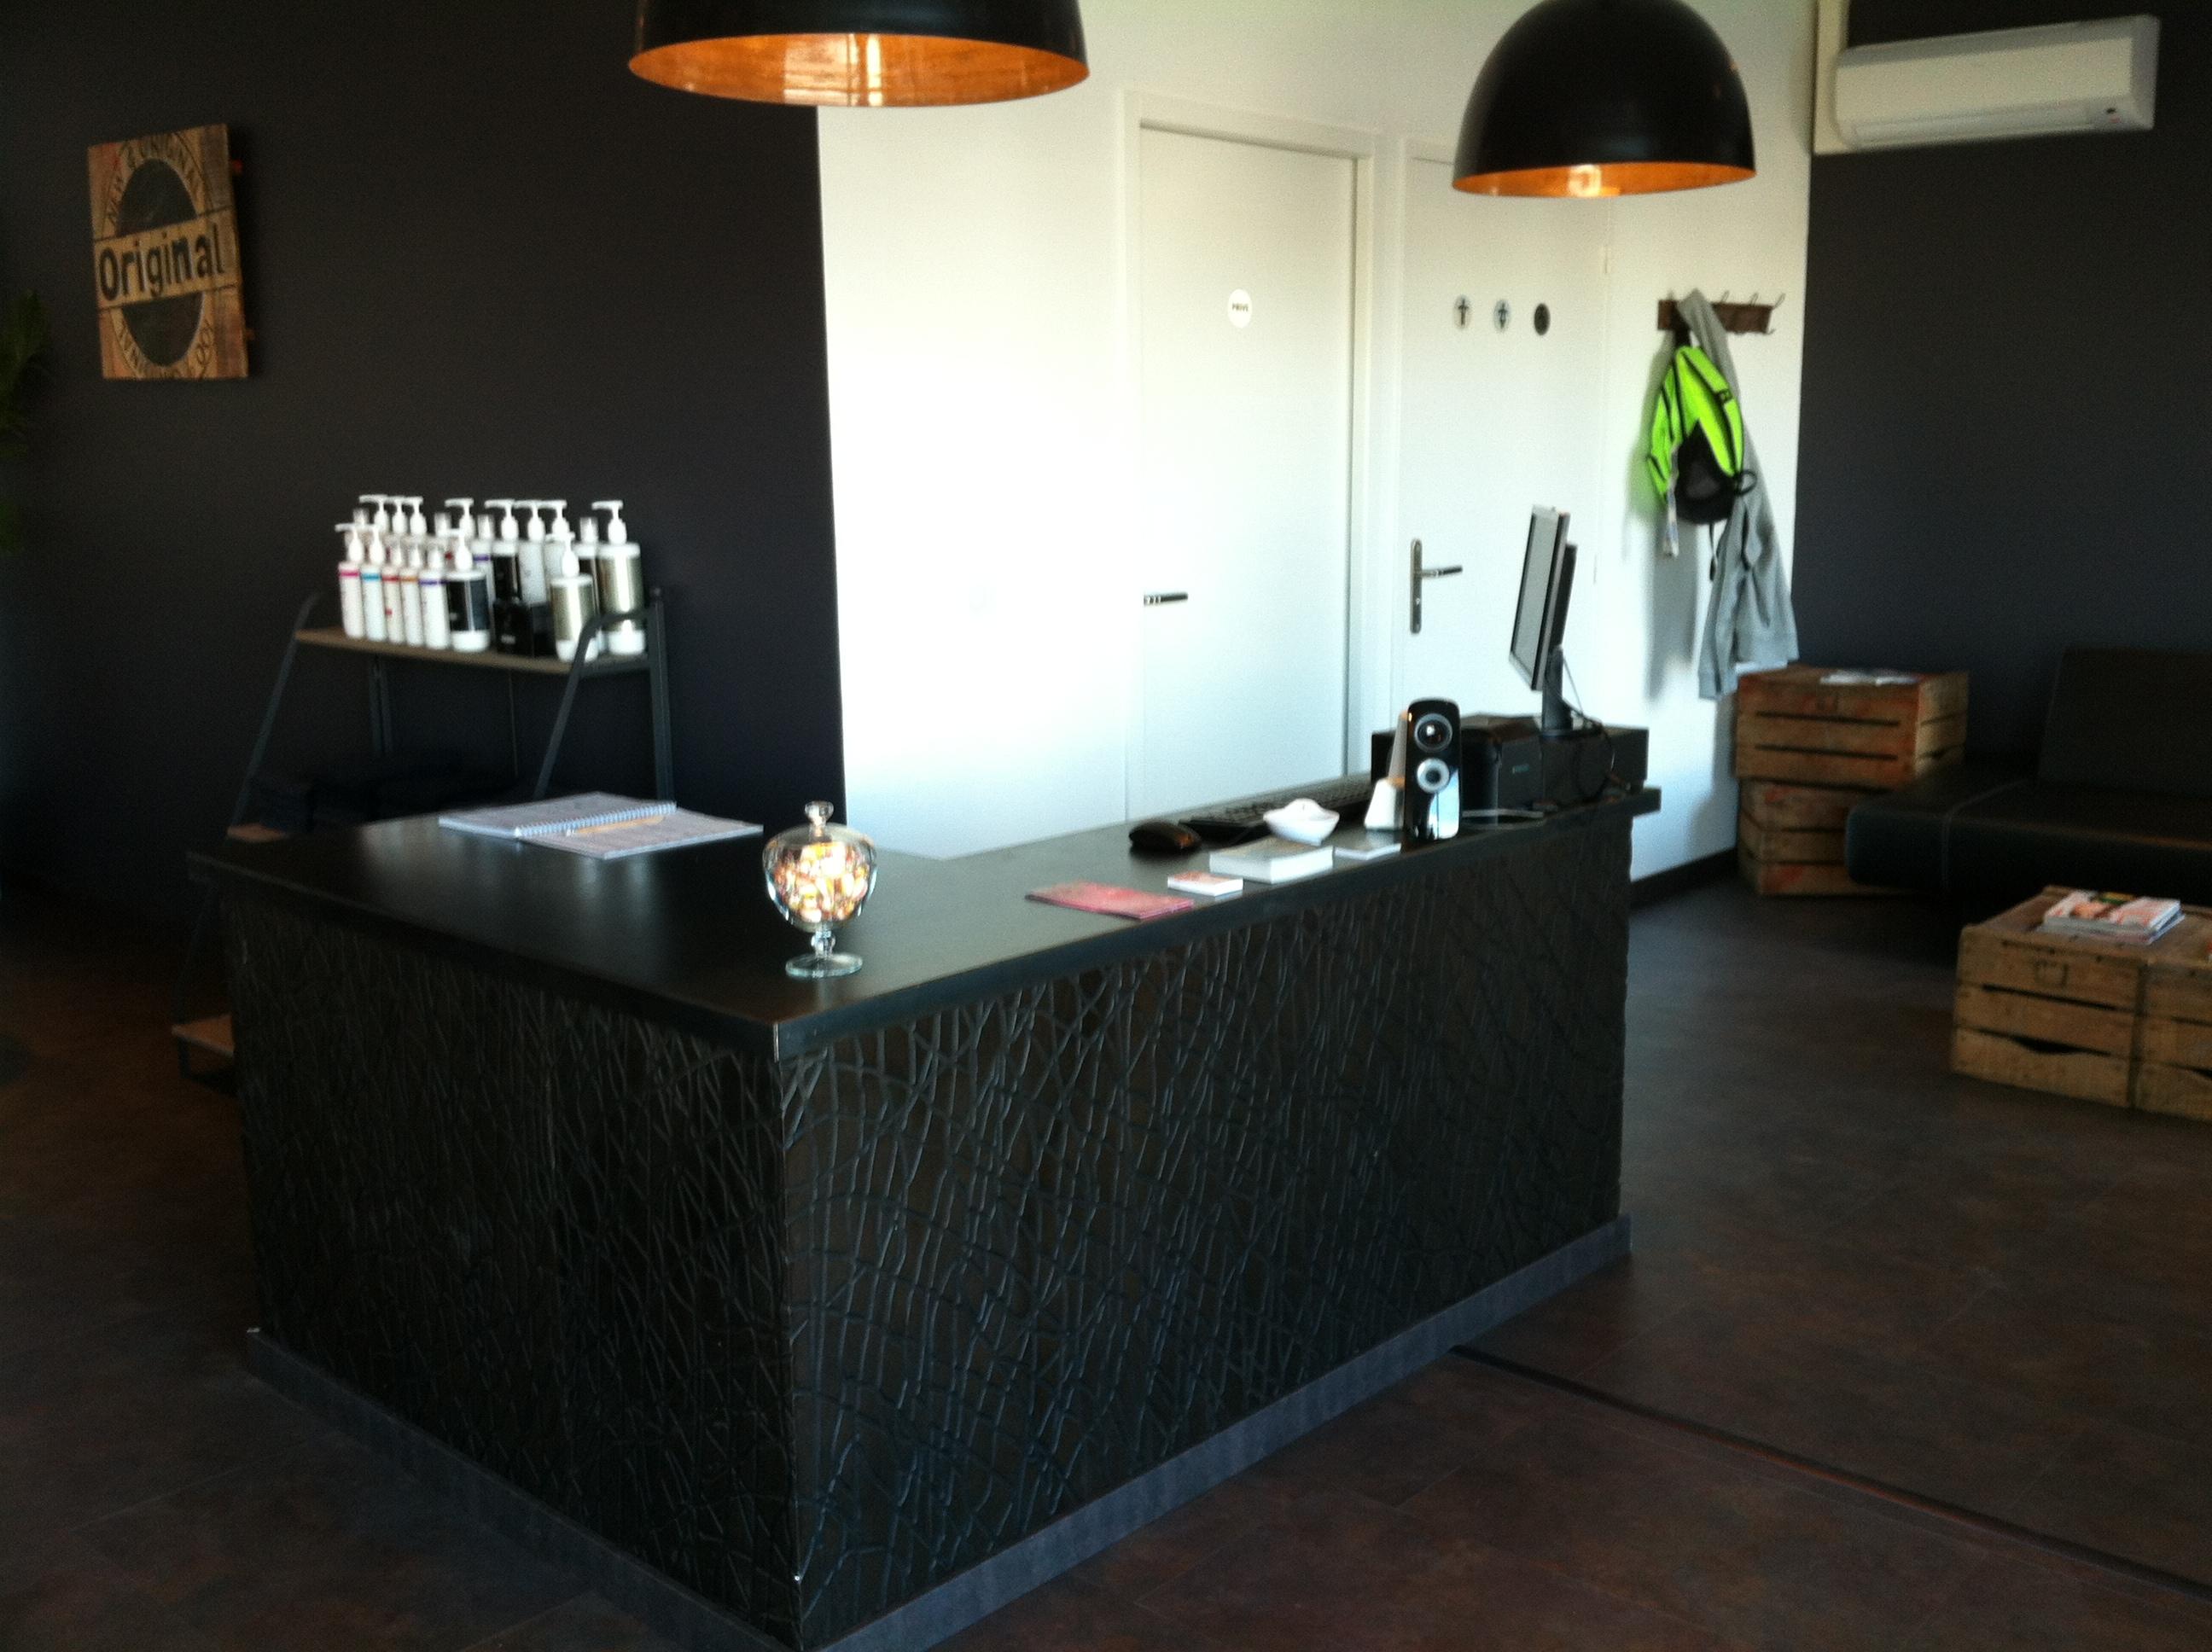 L'Atelier N°24 Cournon-d'Auvergne